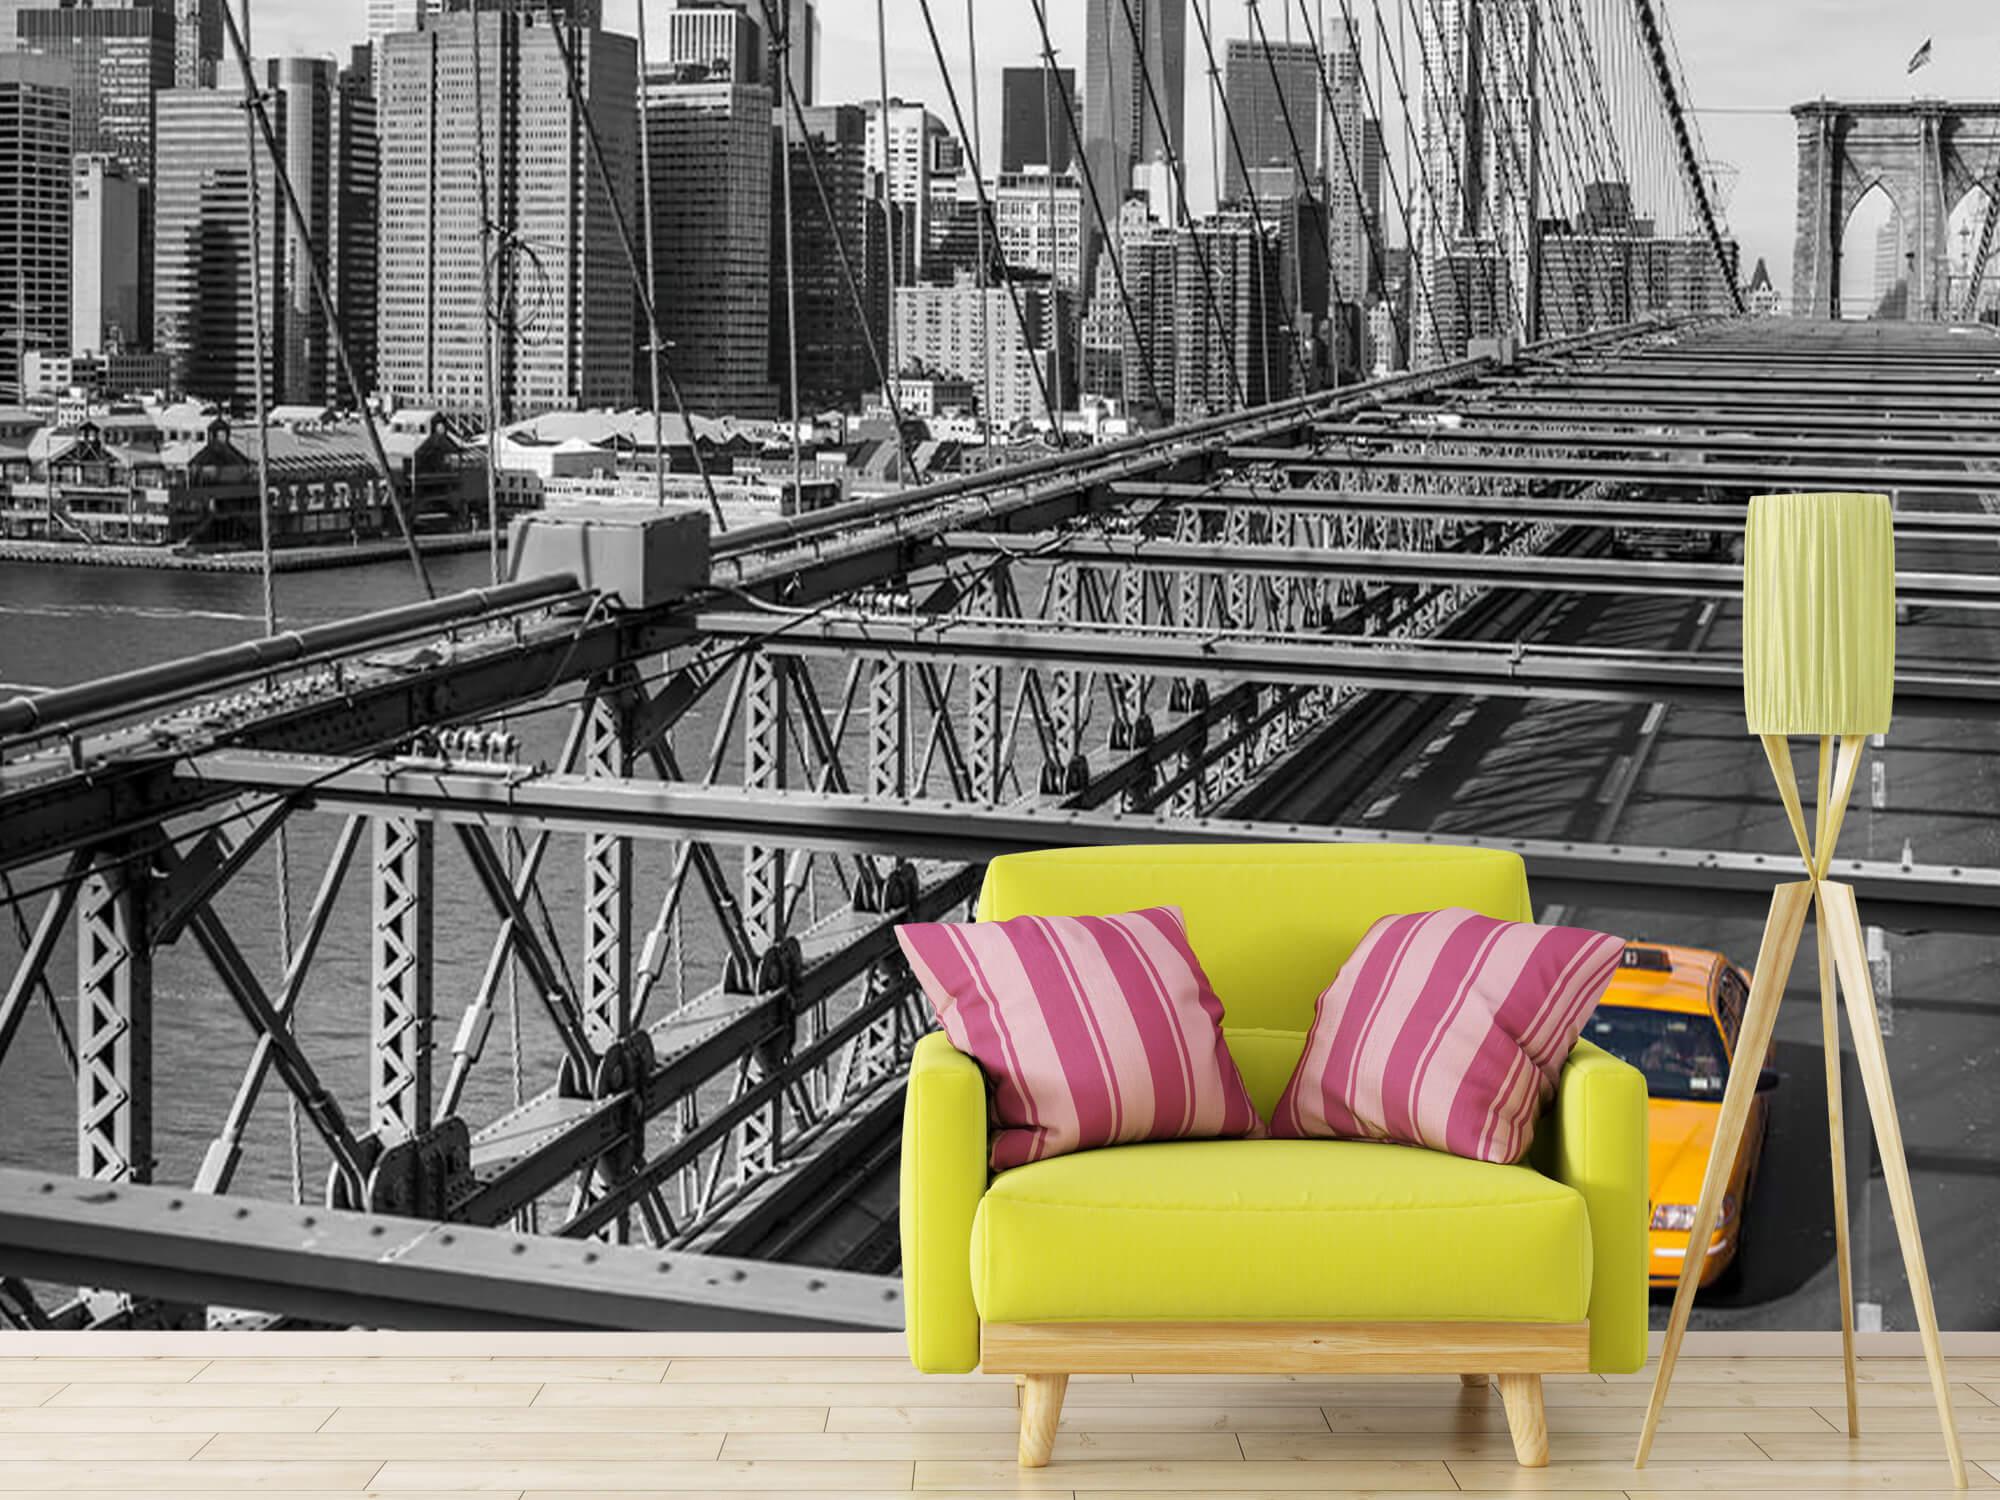 Un taxi sur le pont de Brooklyn 12